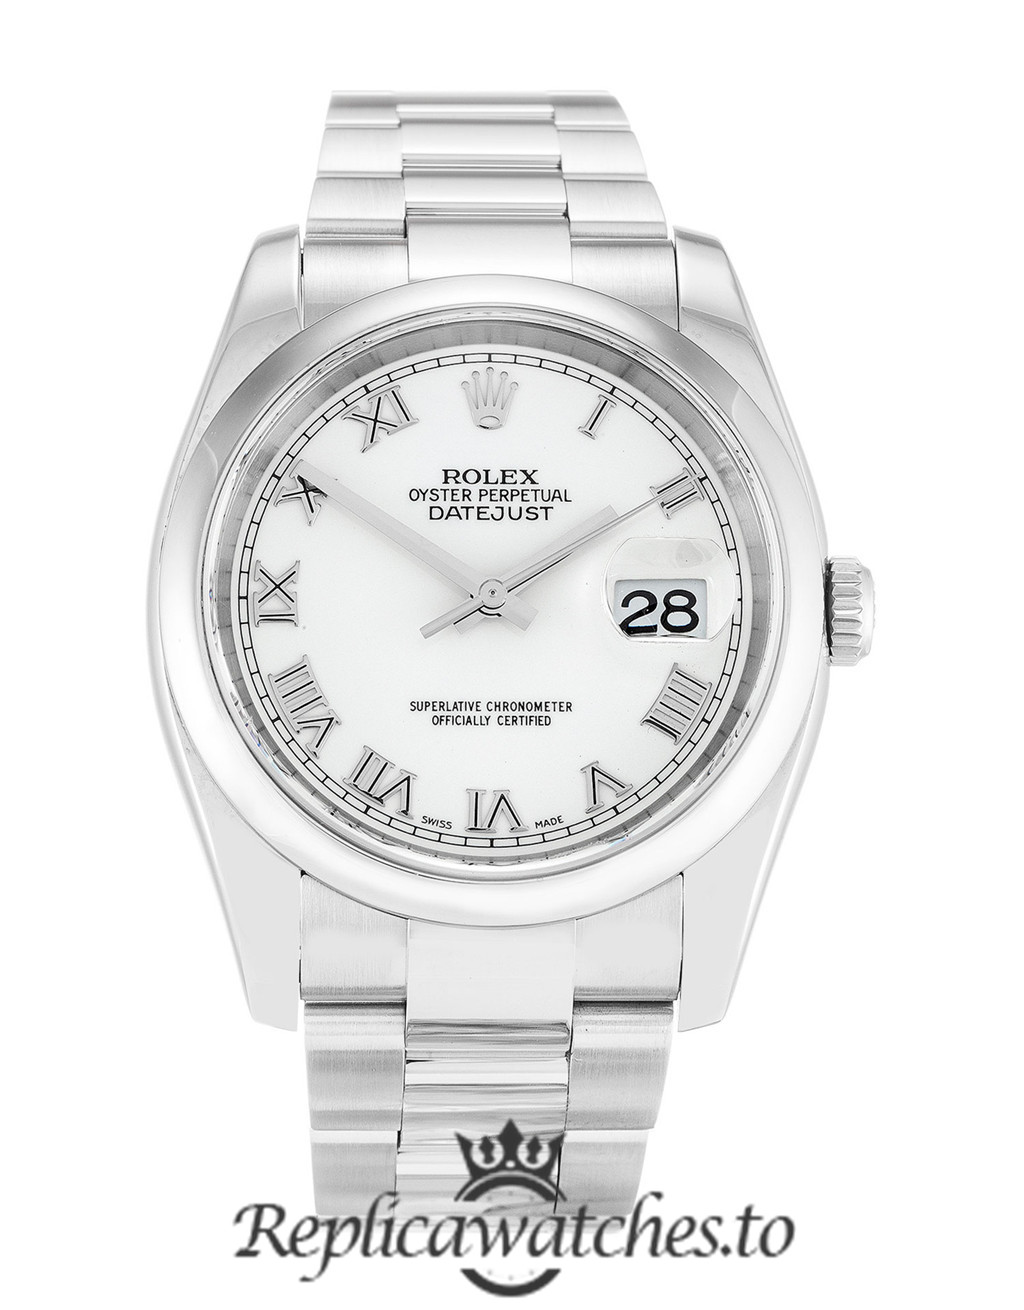 Rolex Datejust Replica 116200 006 Stainless Steel Strap 36MM